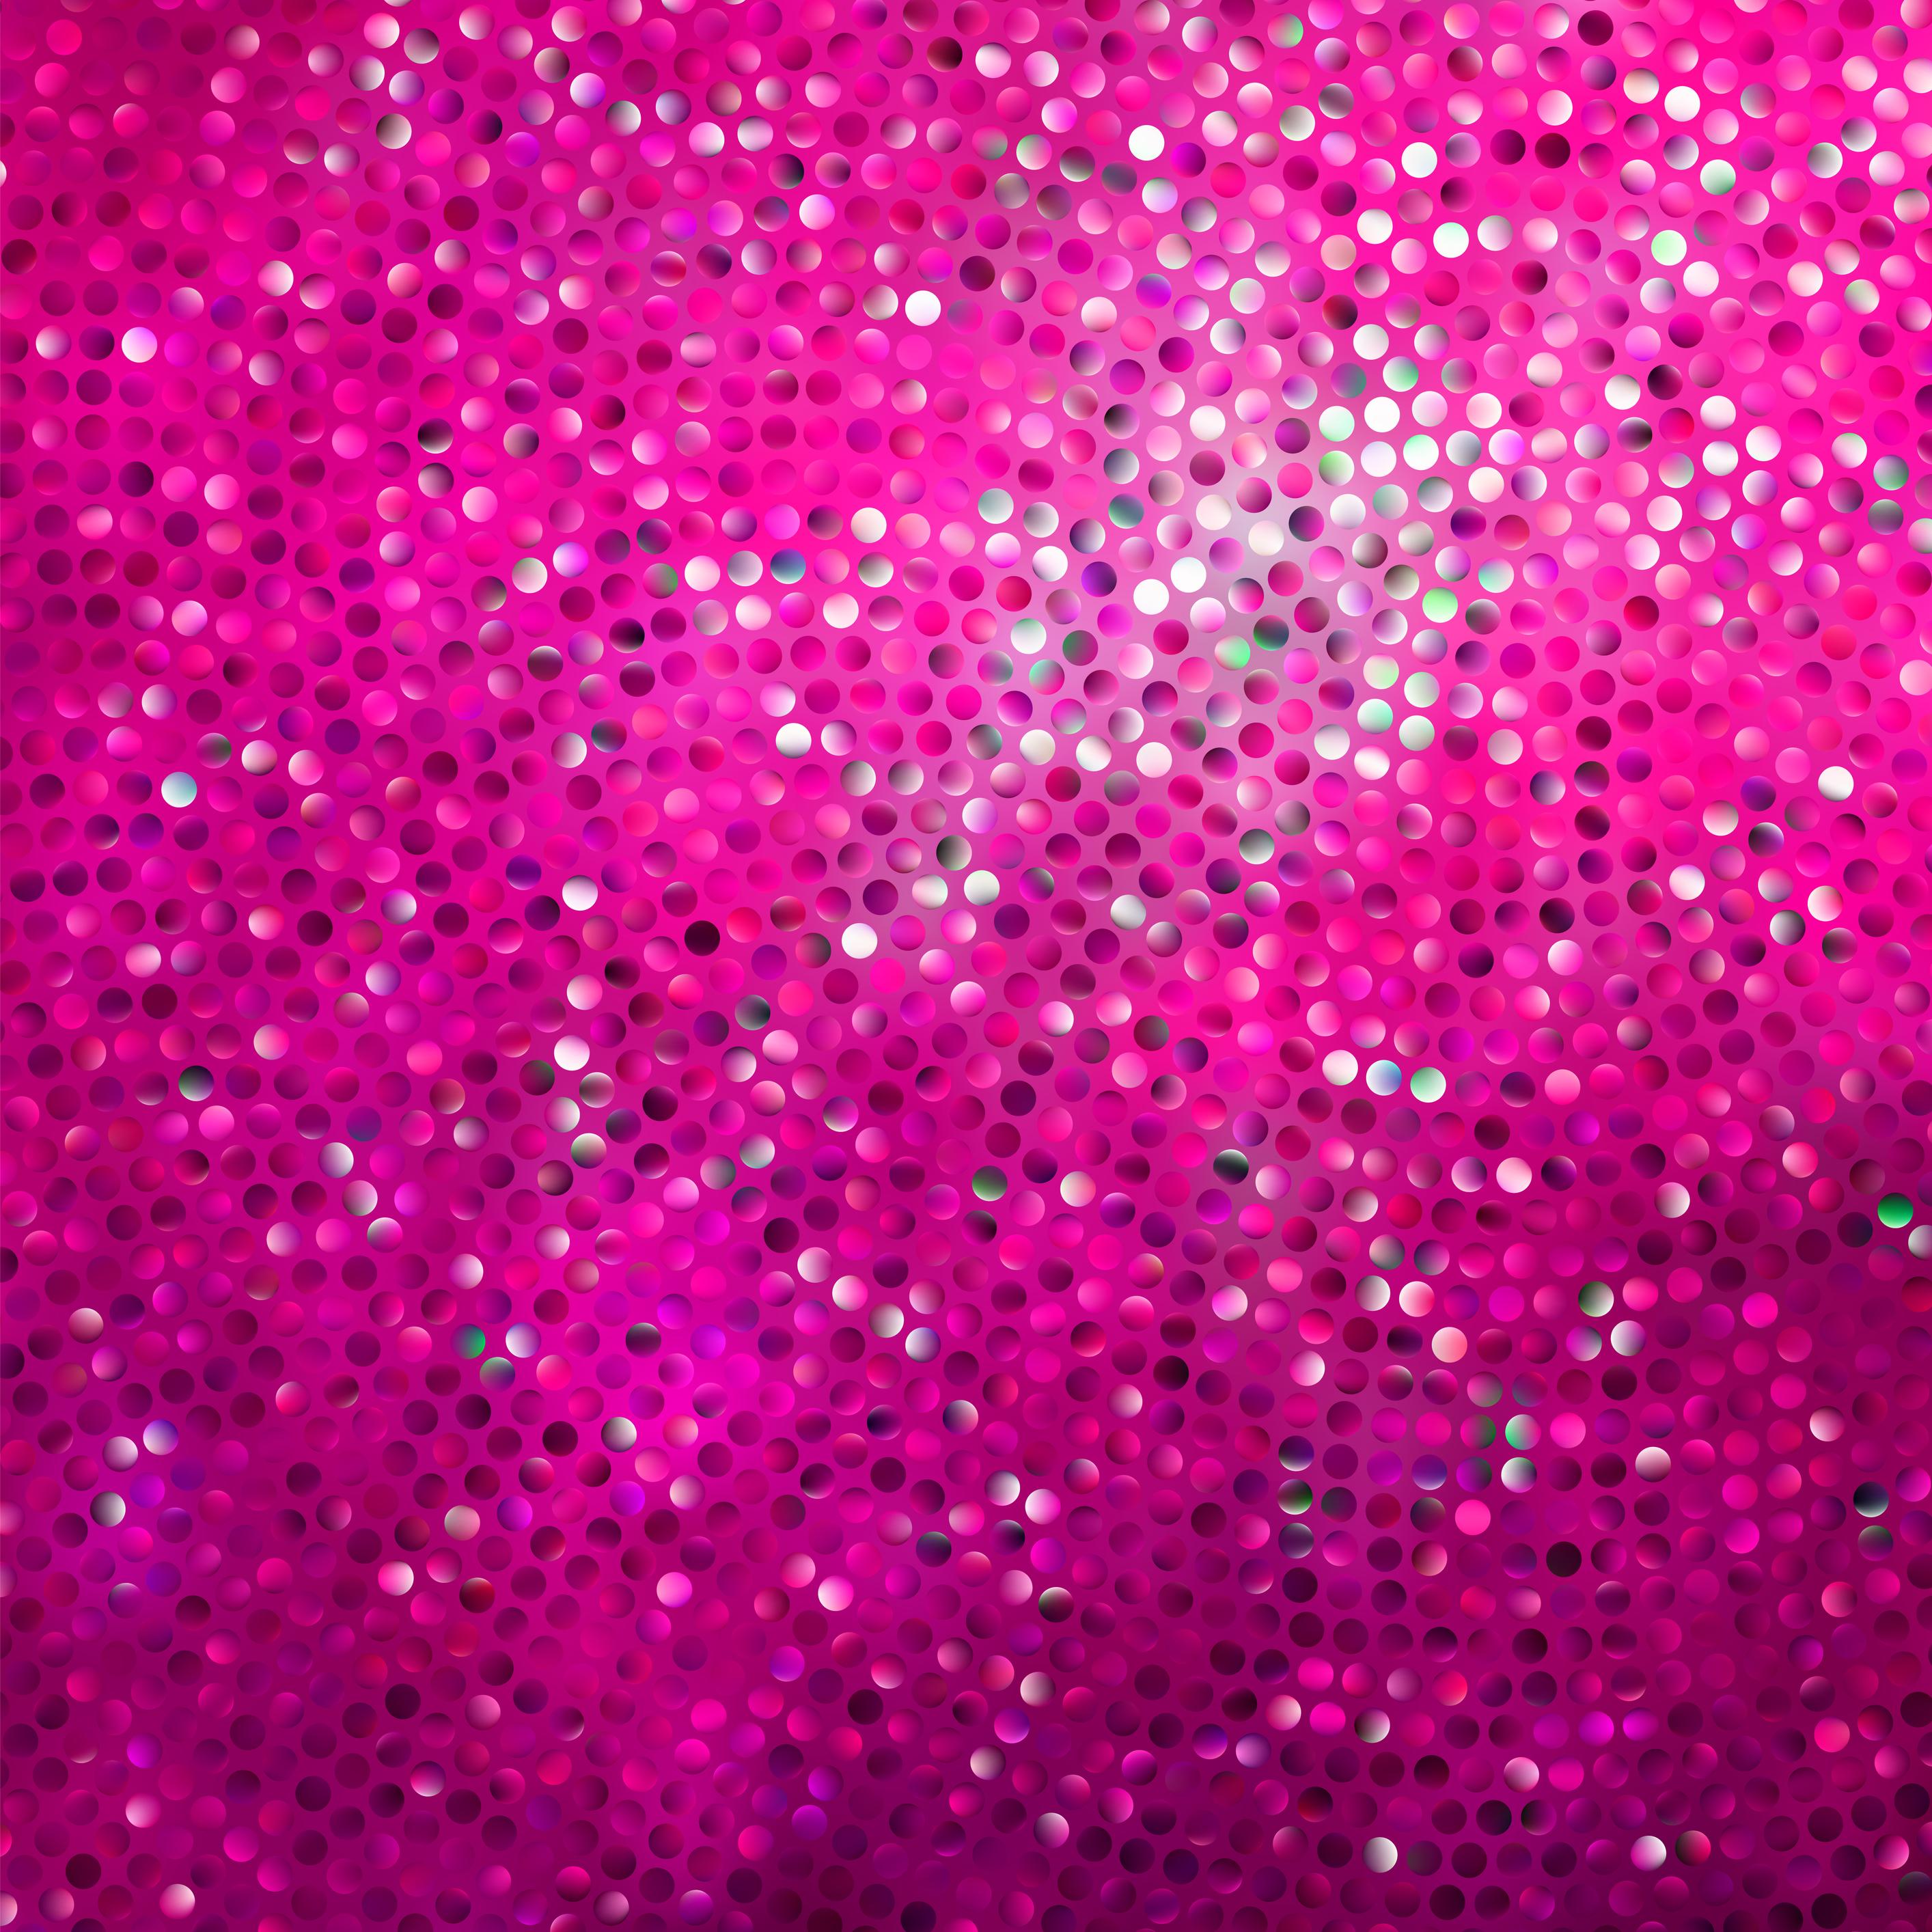 pink glittering